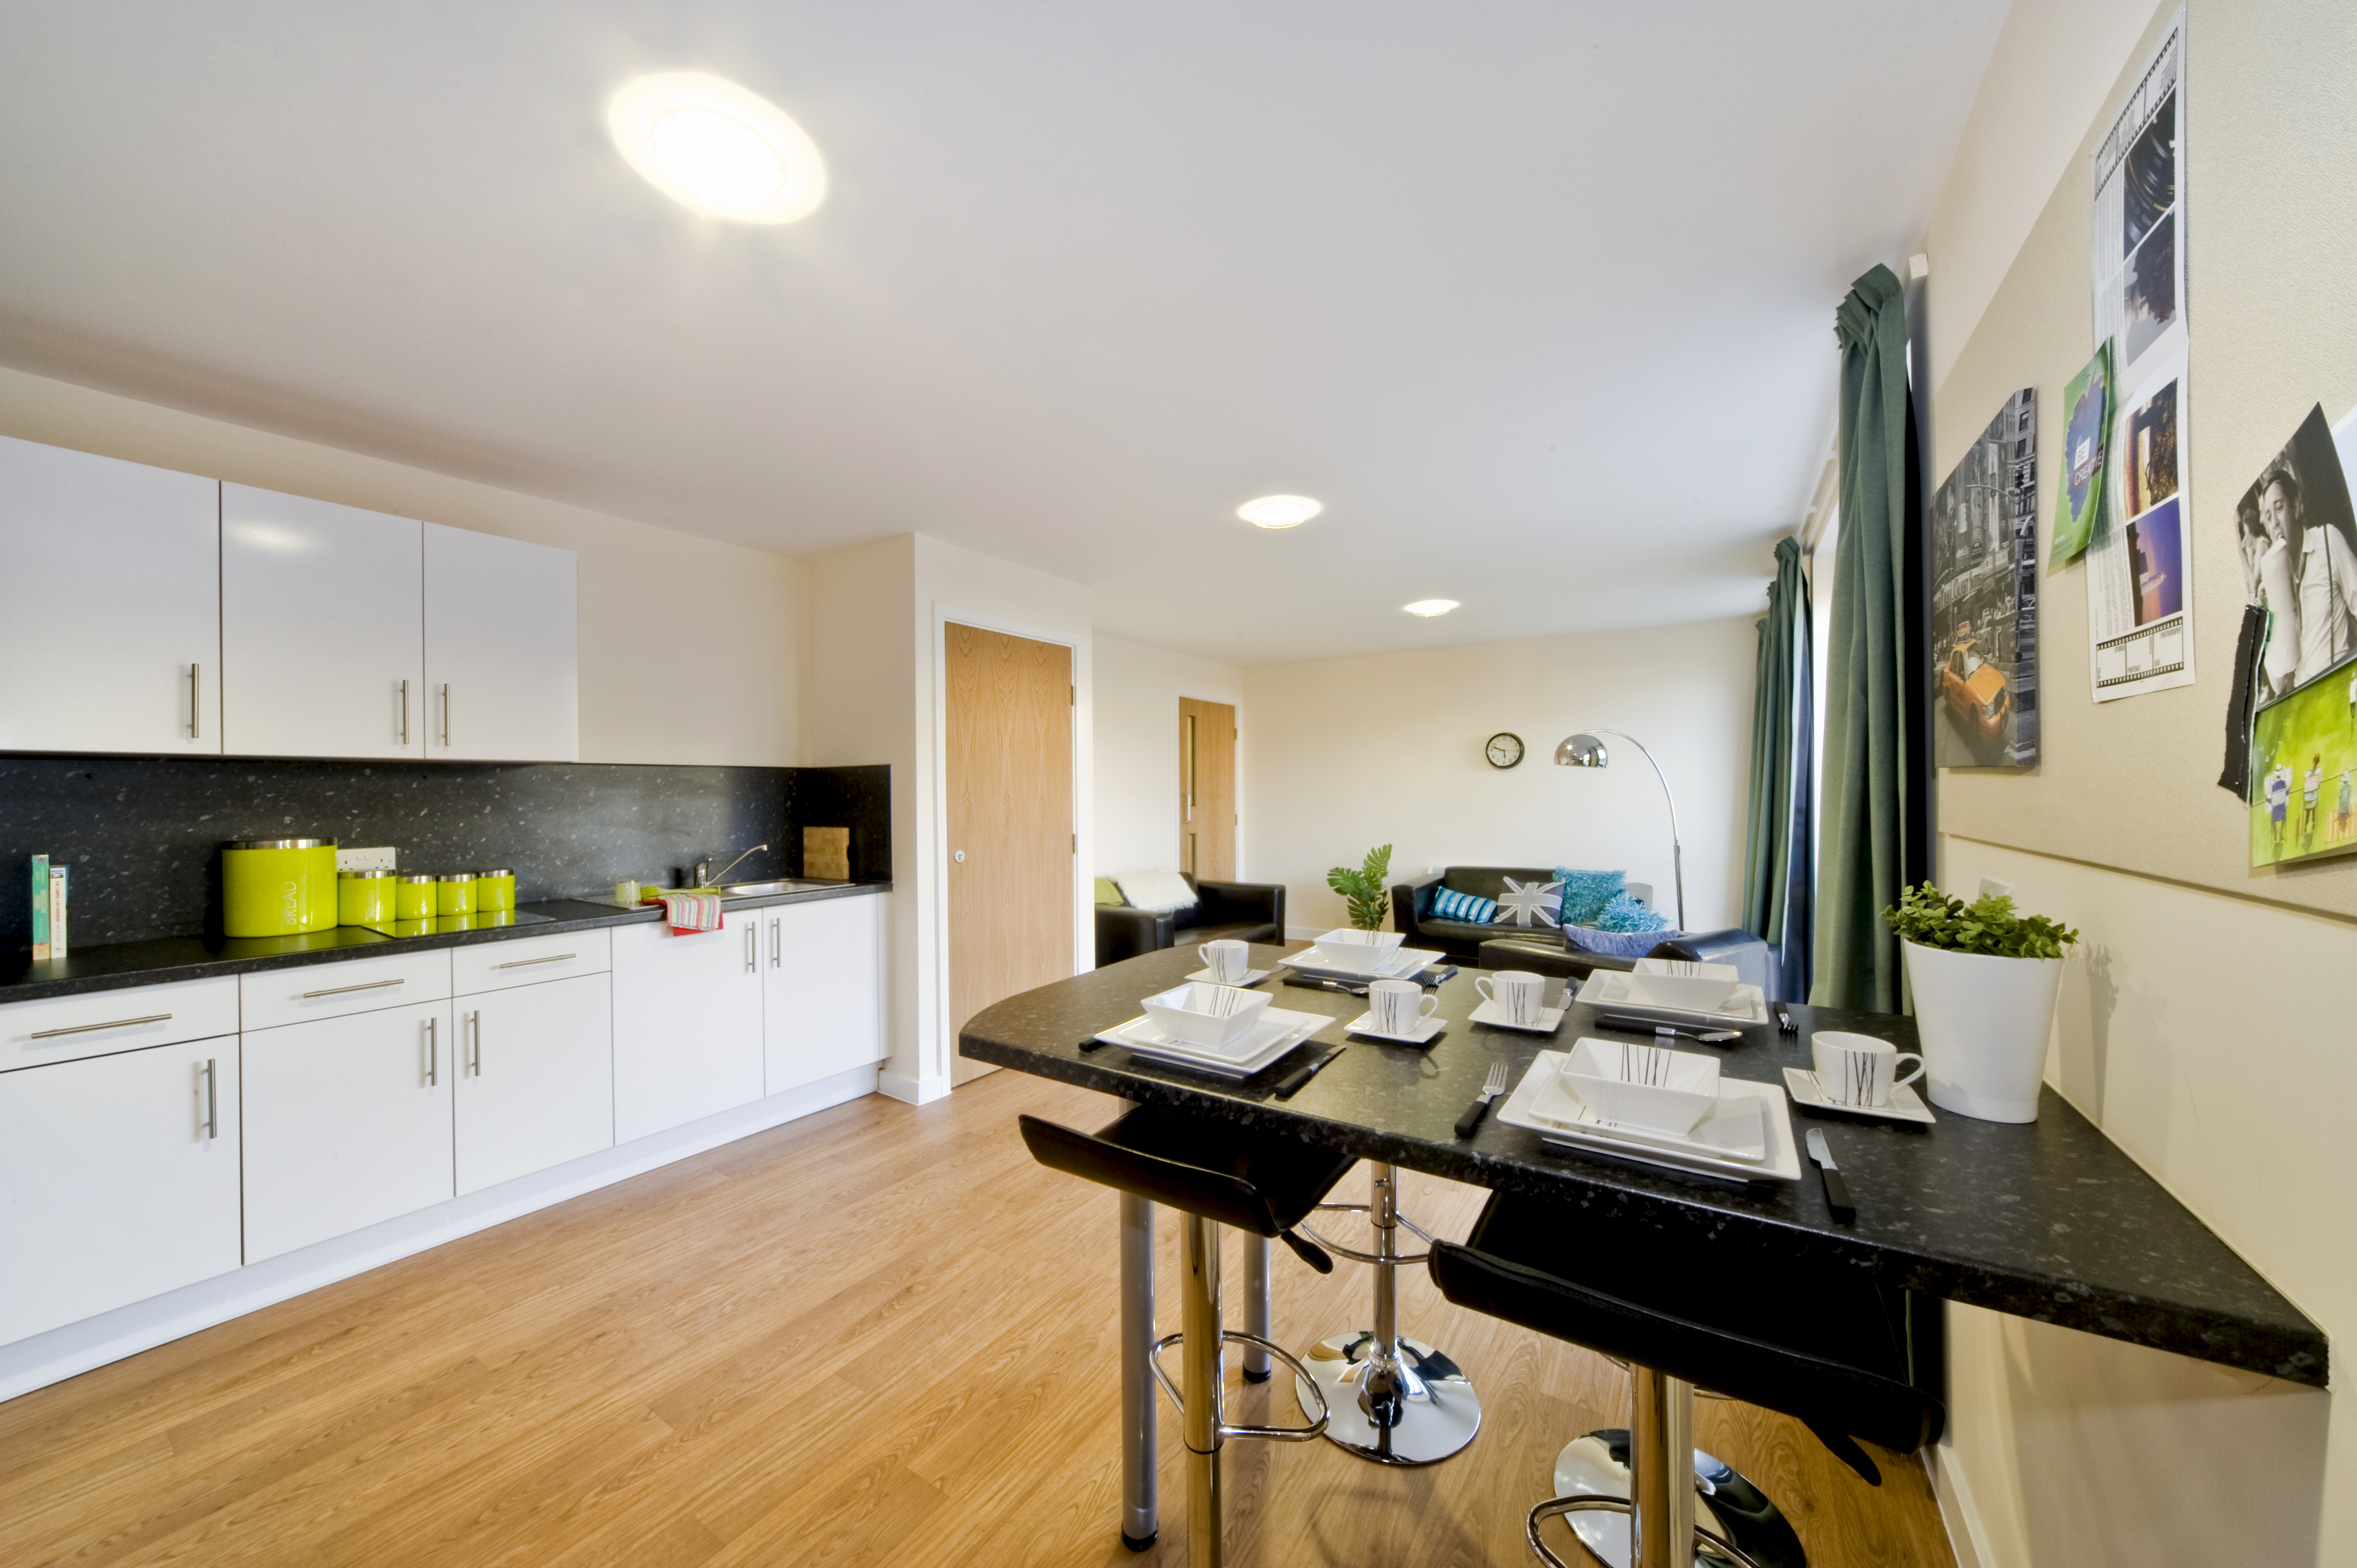 dorchester-house-summer-residence-kitche